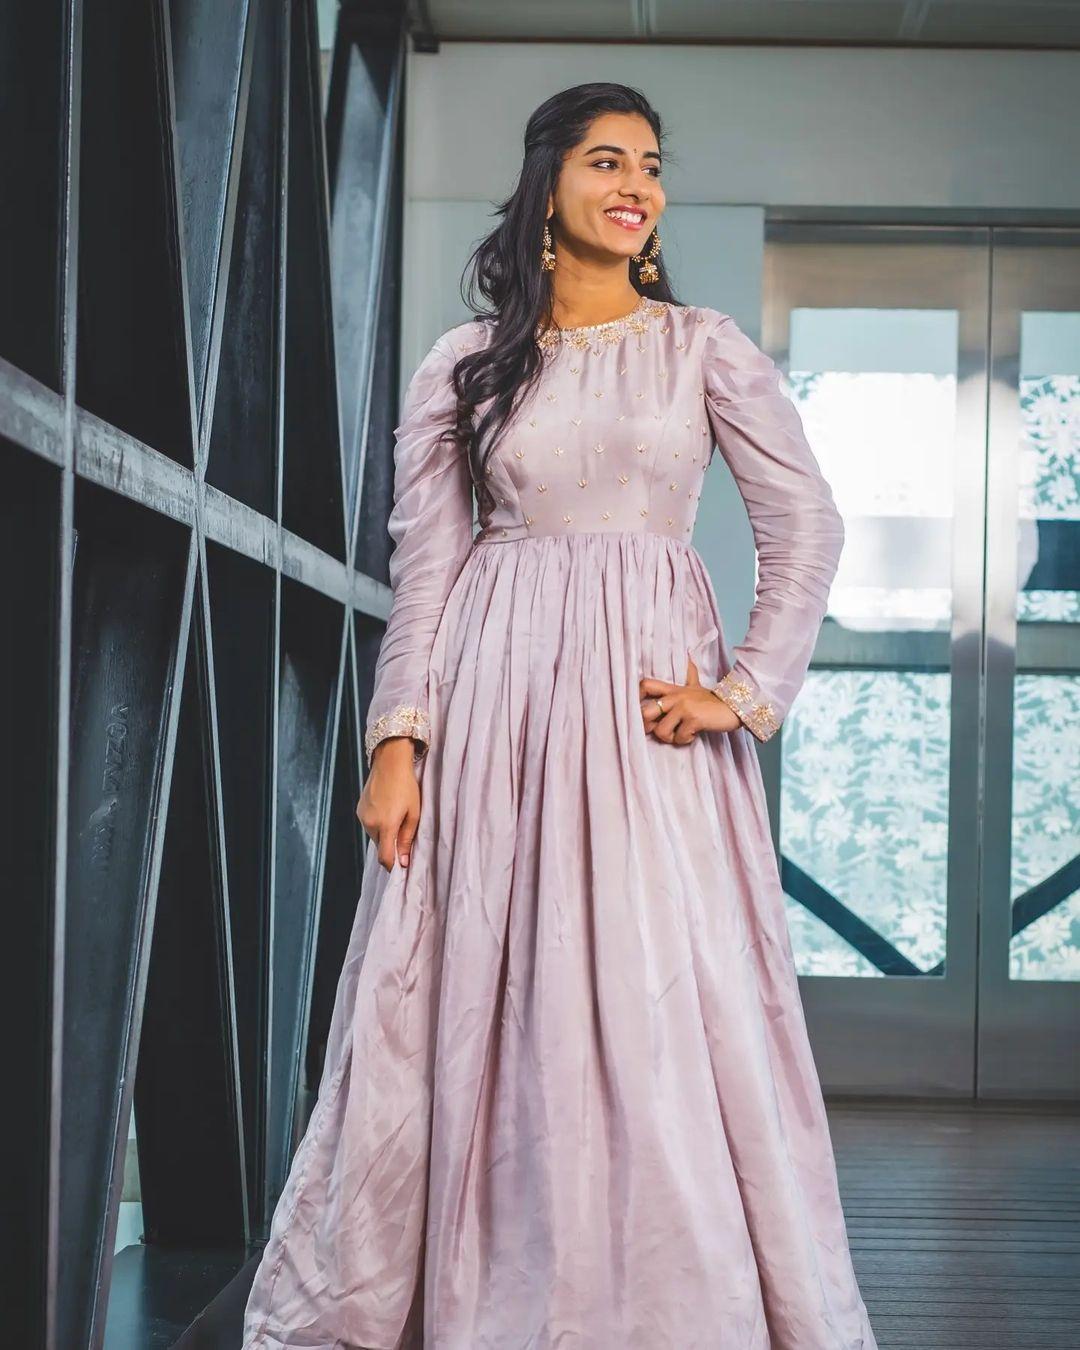 Beautiful actress Vishnu Priya in lavender floor length dress. Styling : Greeshm krishna.k Label : Rv designer studio by rupa.  2021-09-17